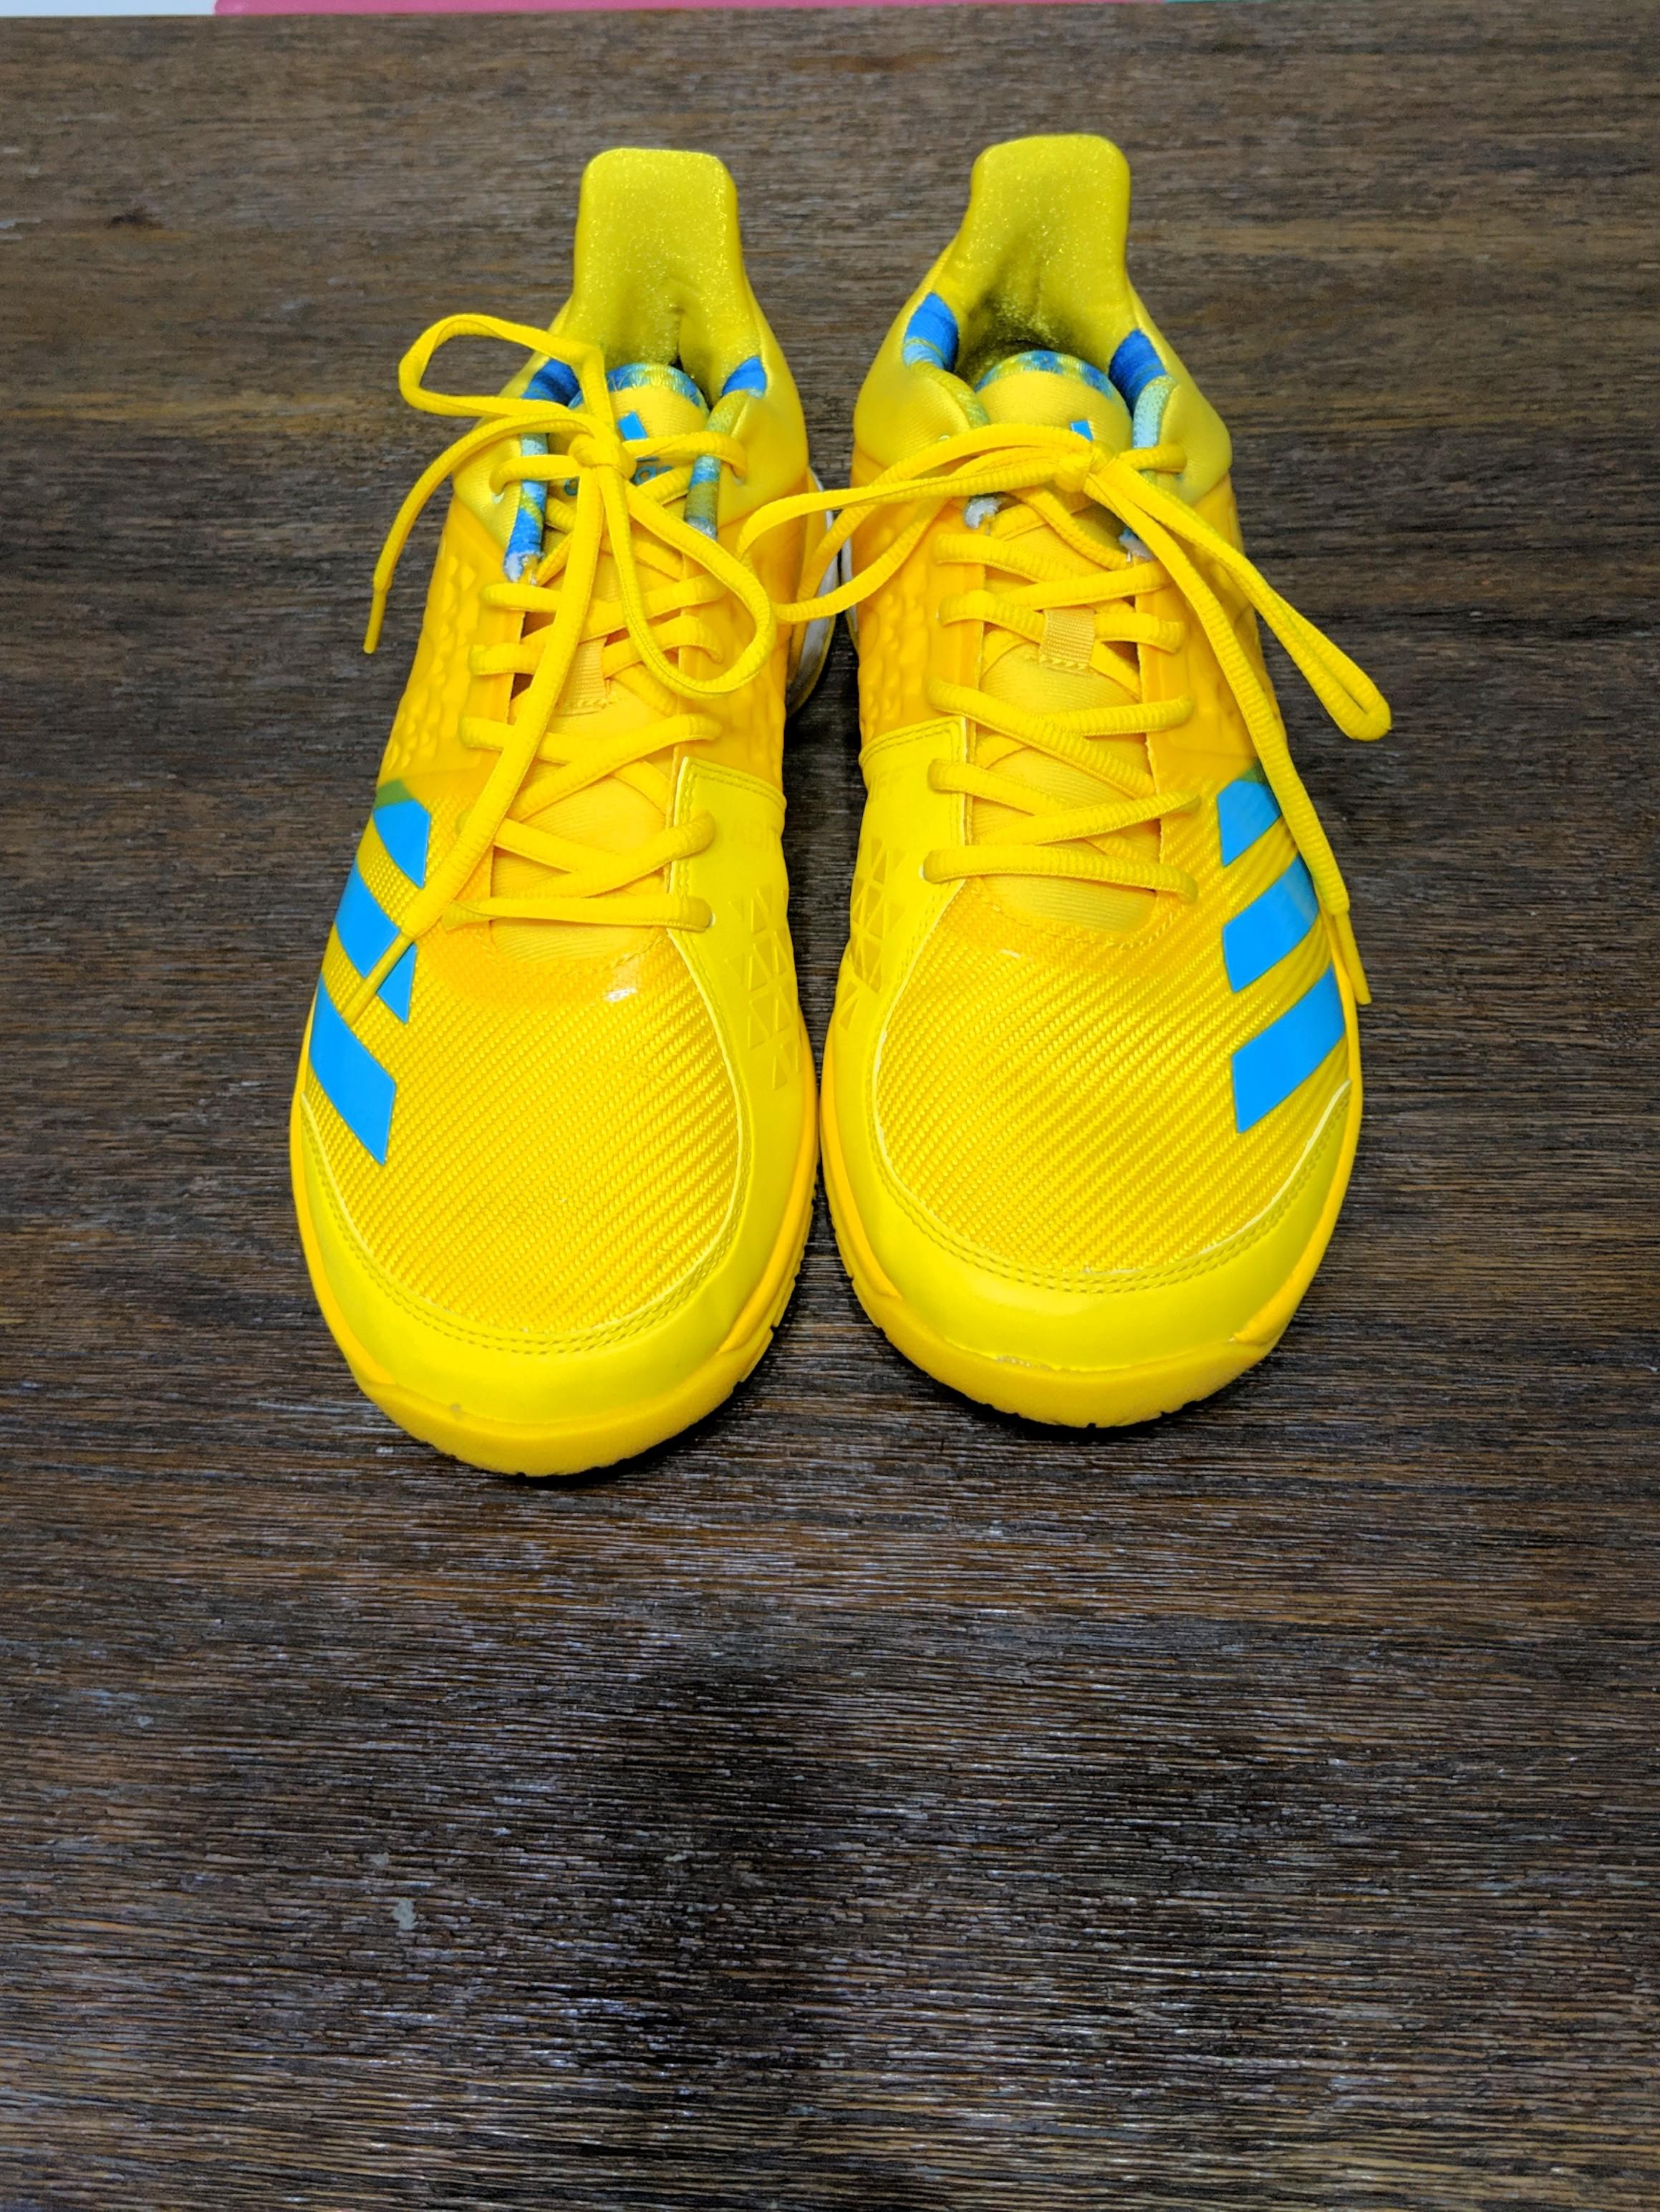 21e9664f95b1 Adidas Wucht P8 badminton shoes US8.5